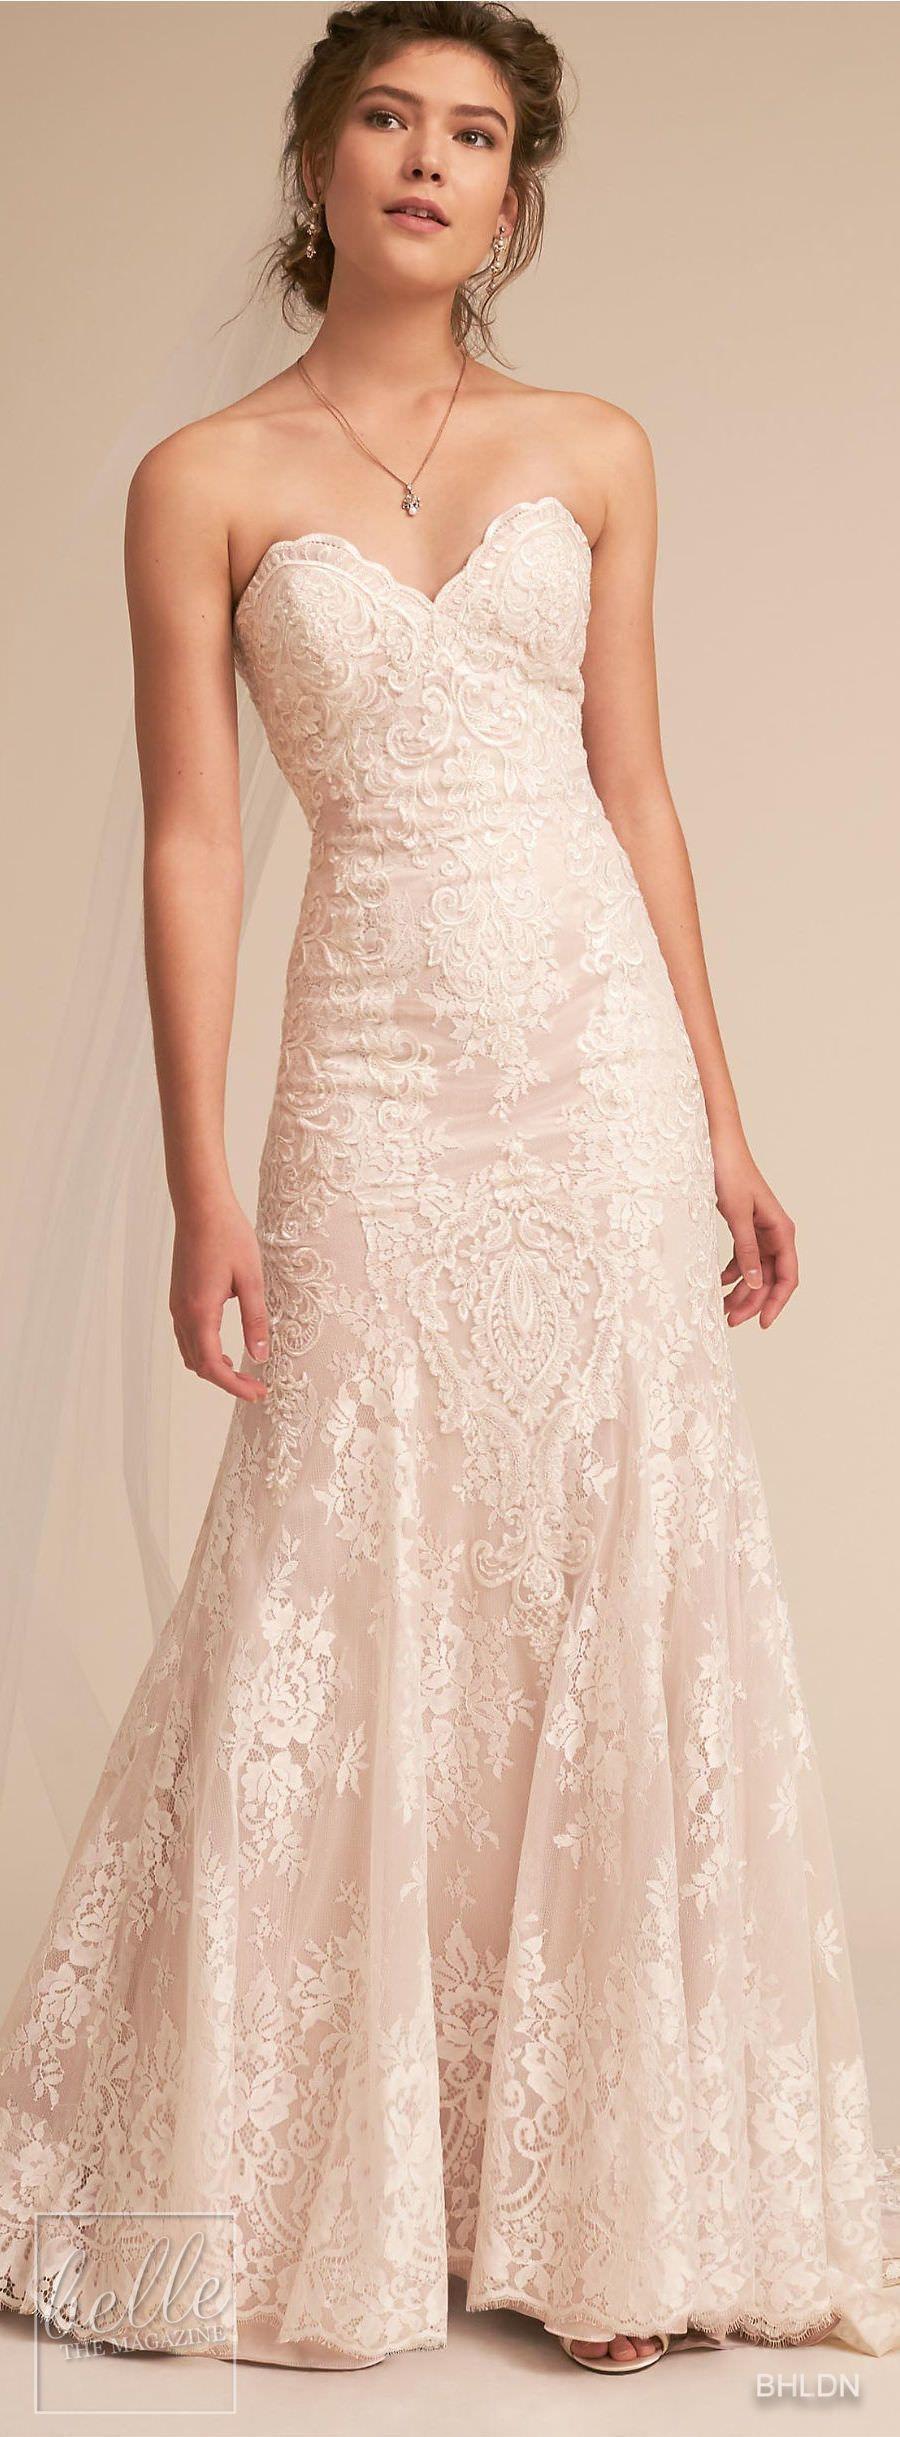 Our favorite wedding dresses from bhldn wedding dresses